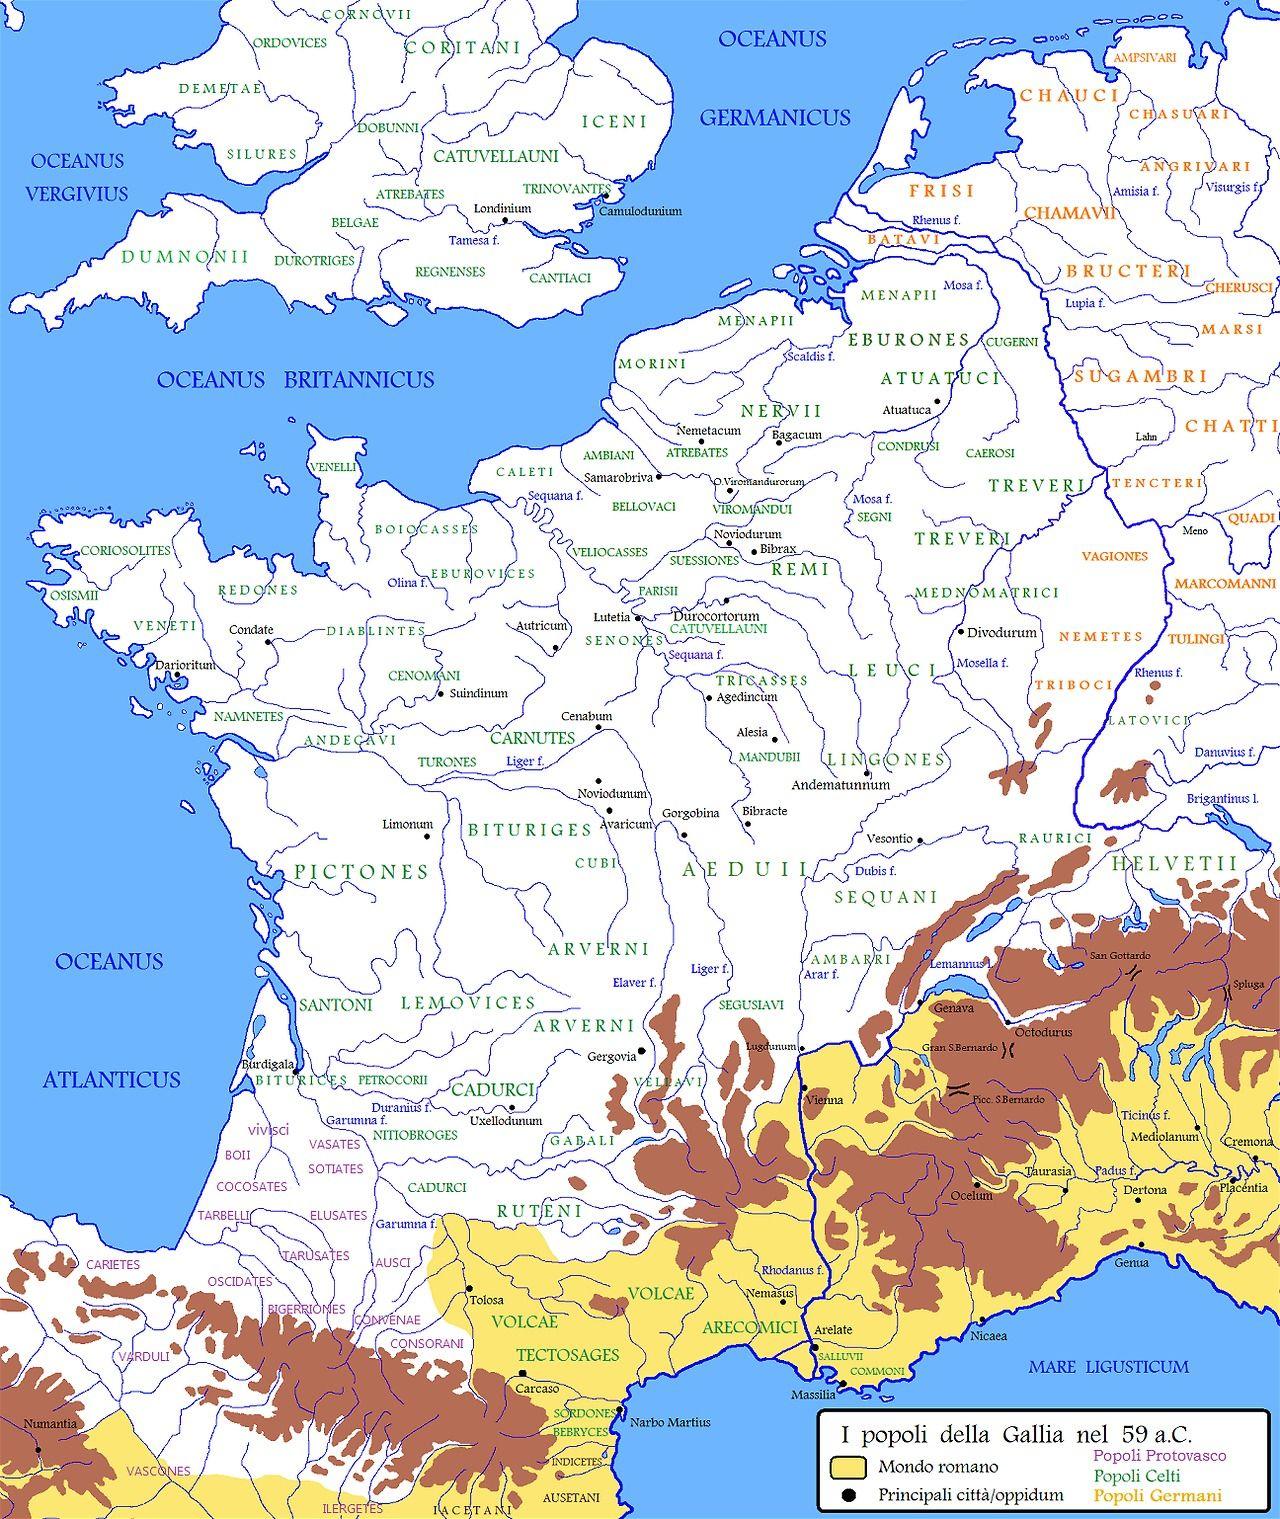 Epingle Sur Carto Protohistoire Antiquite Europeennes